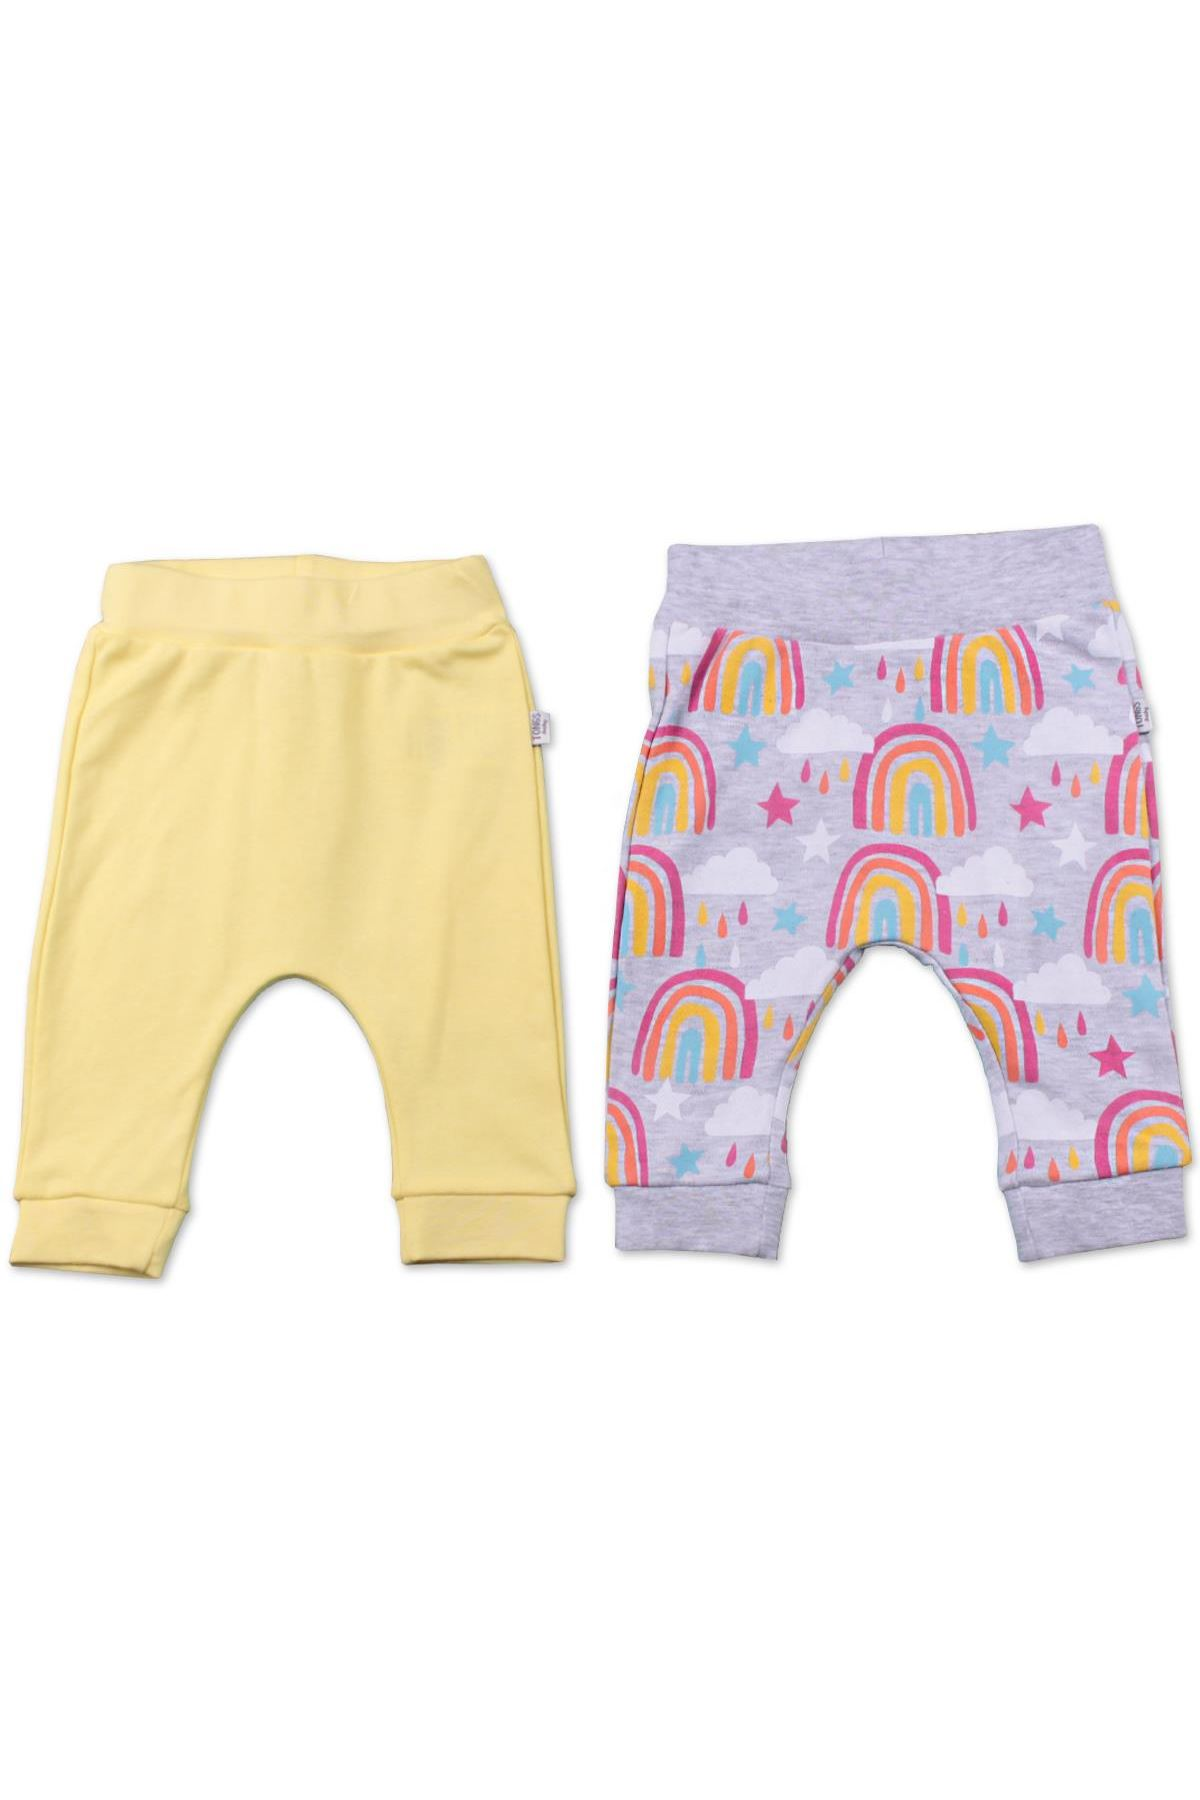 Tongs Baby Tek Alt Pantolon 3130 Sarı